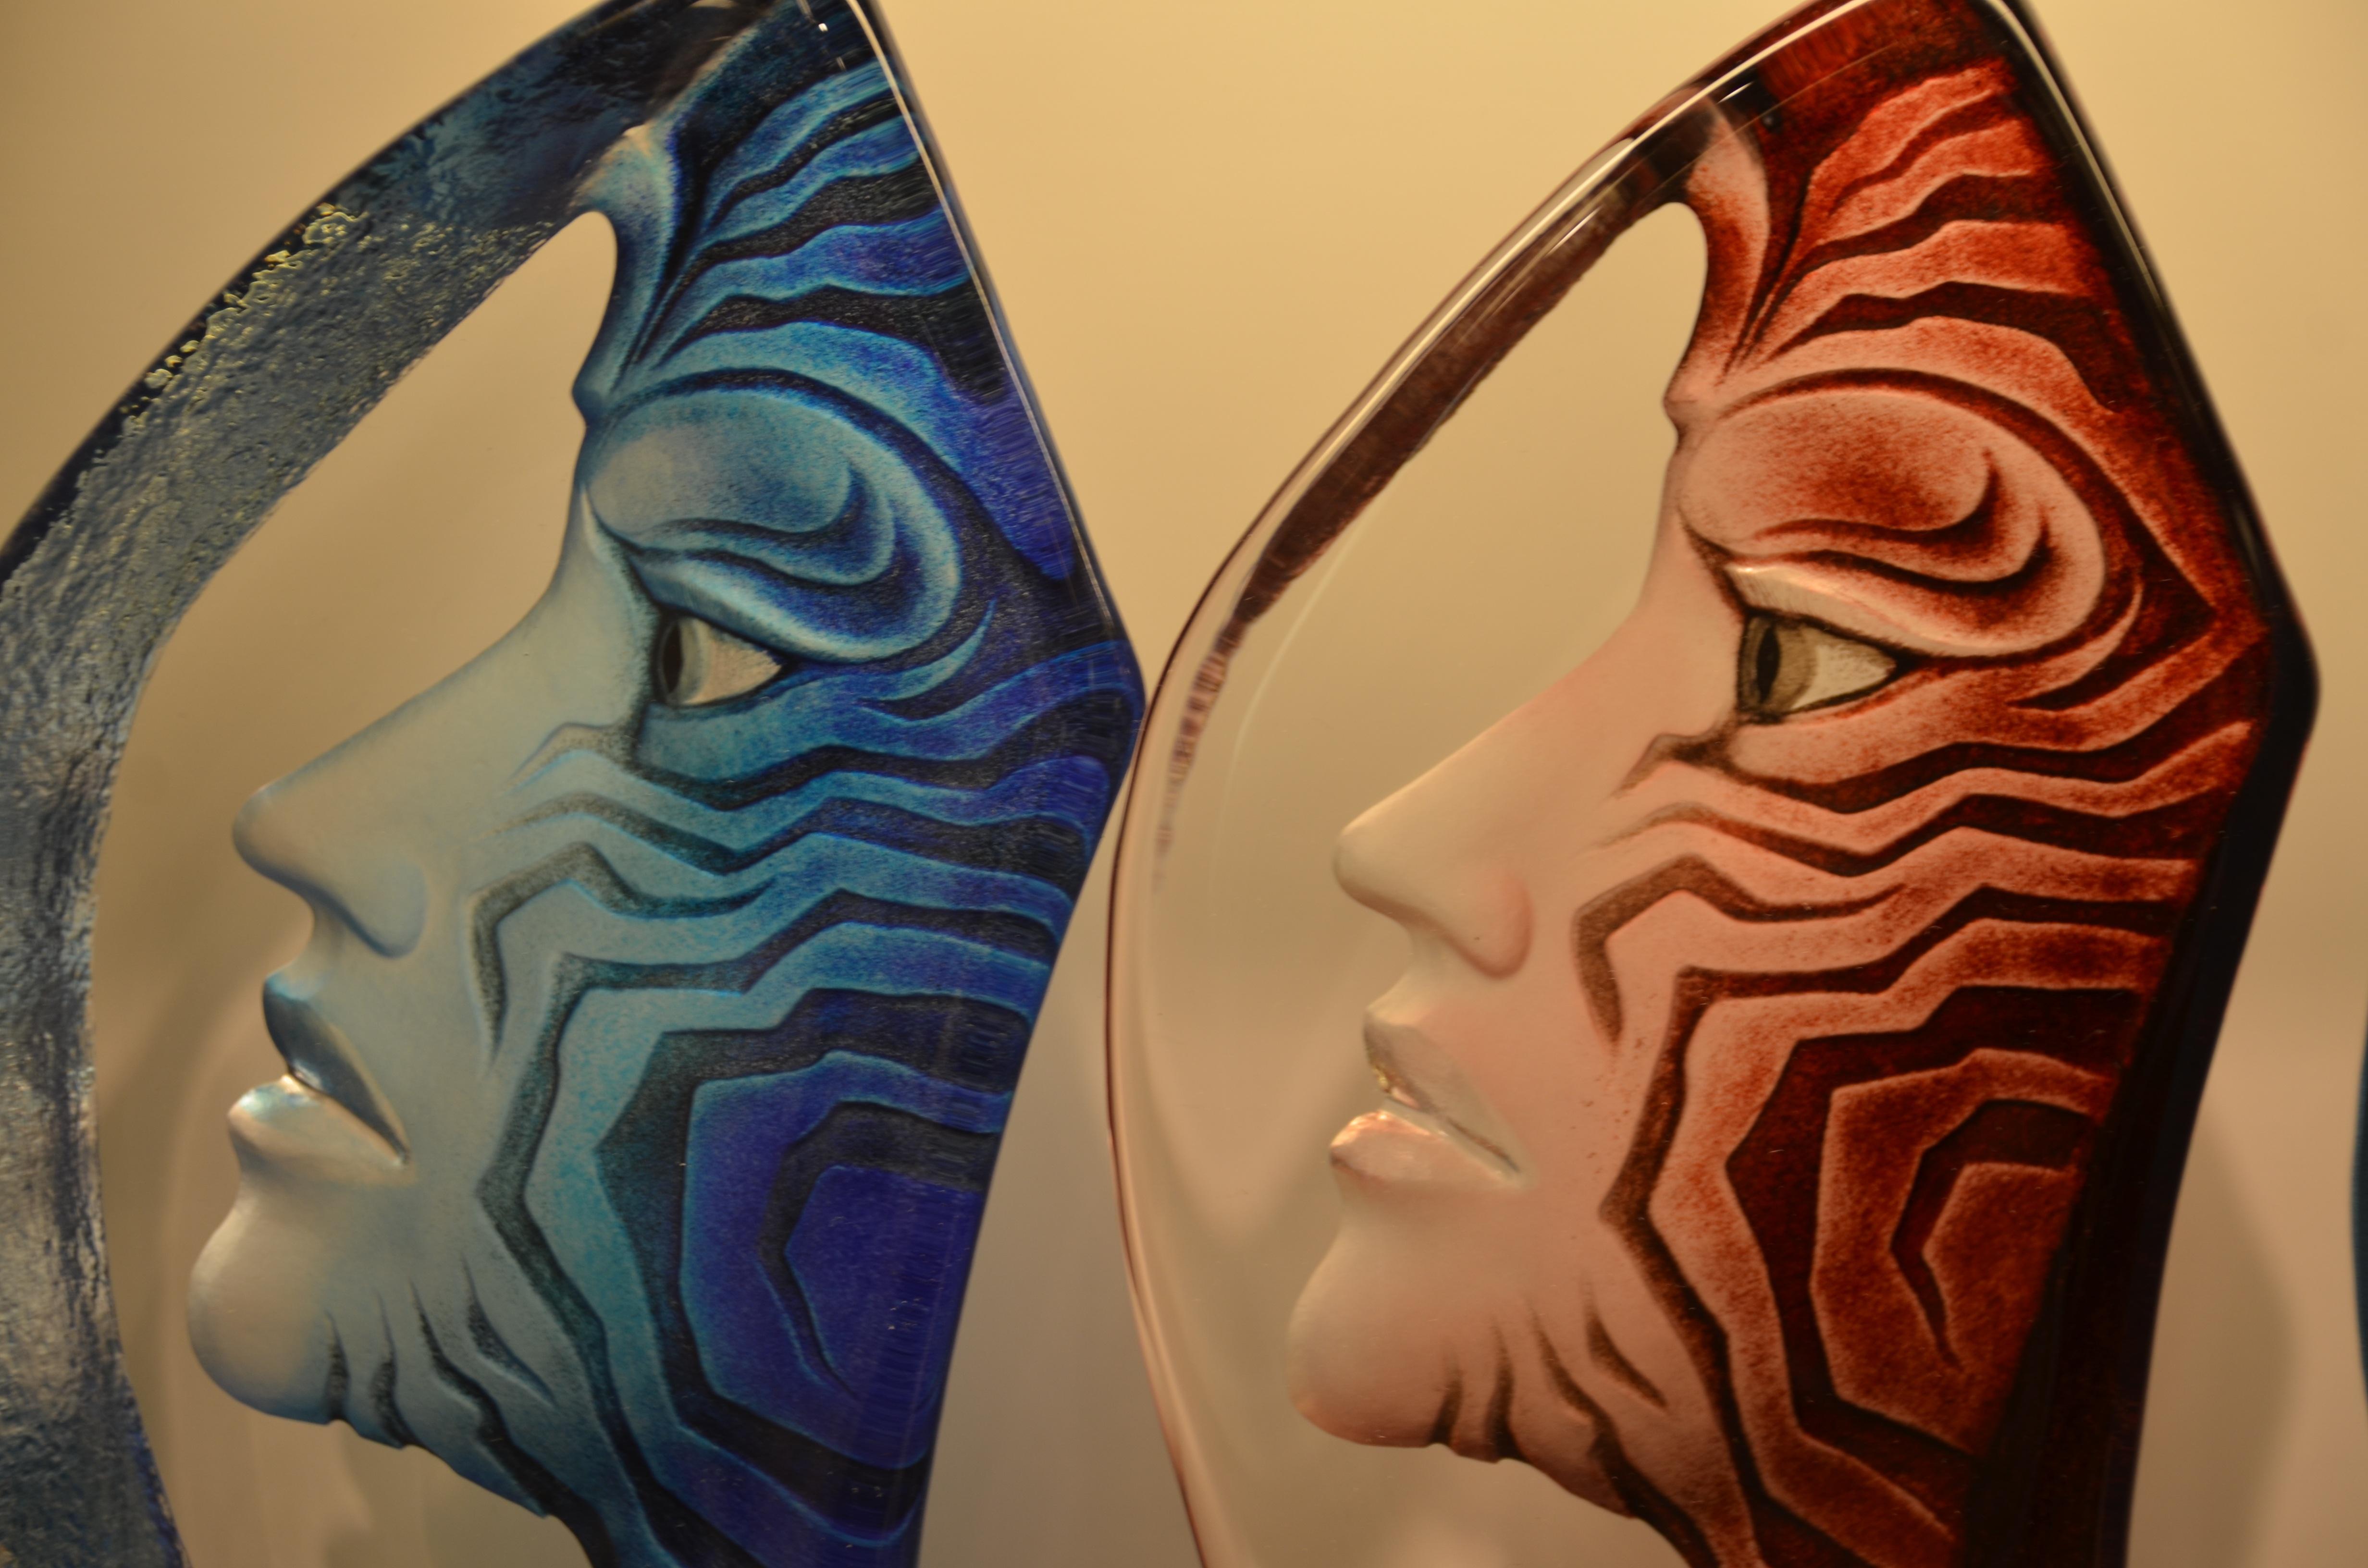 Gambar Abstrak Kaca Profil Warna Lengan Lukisan